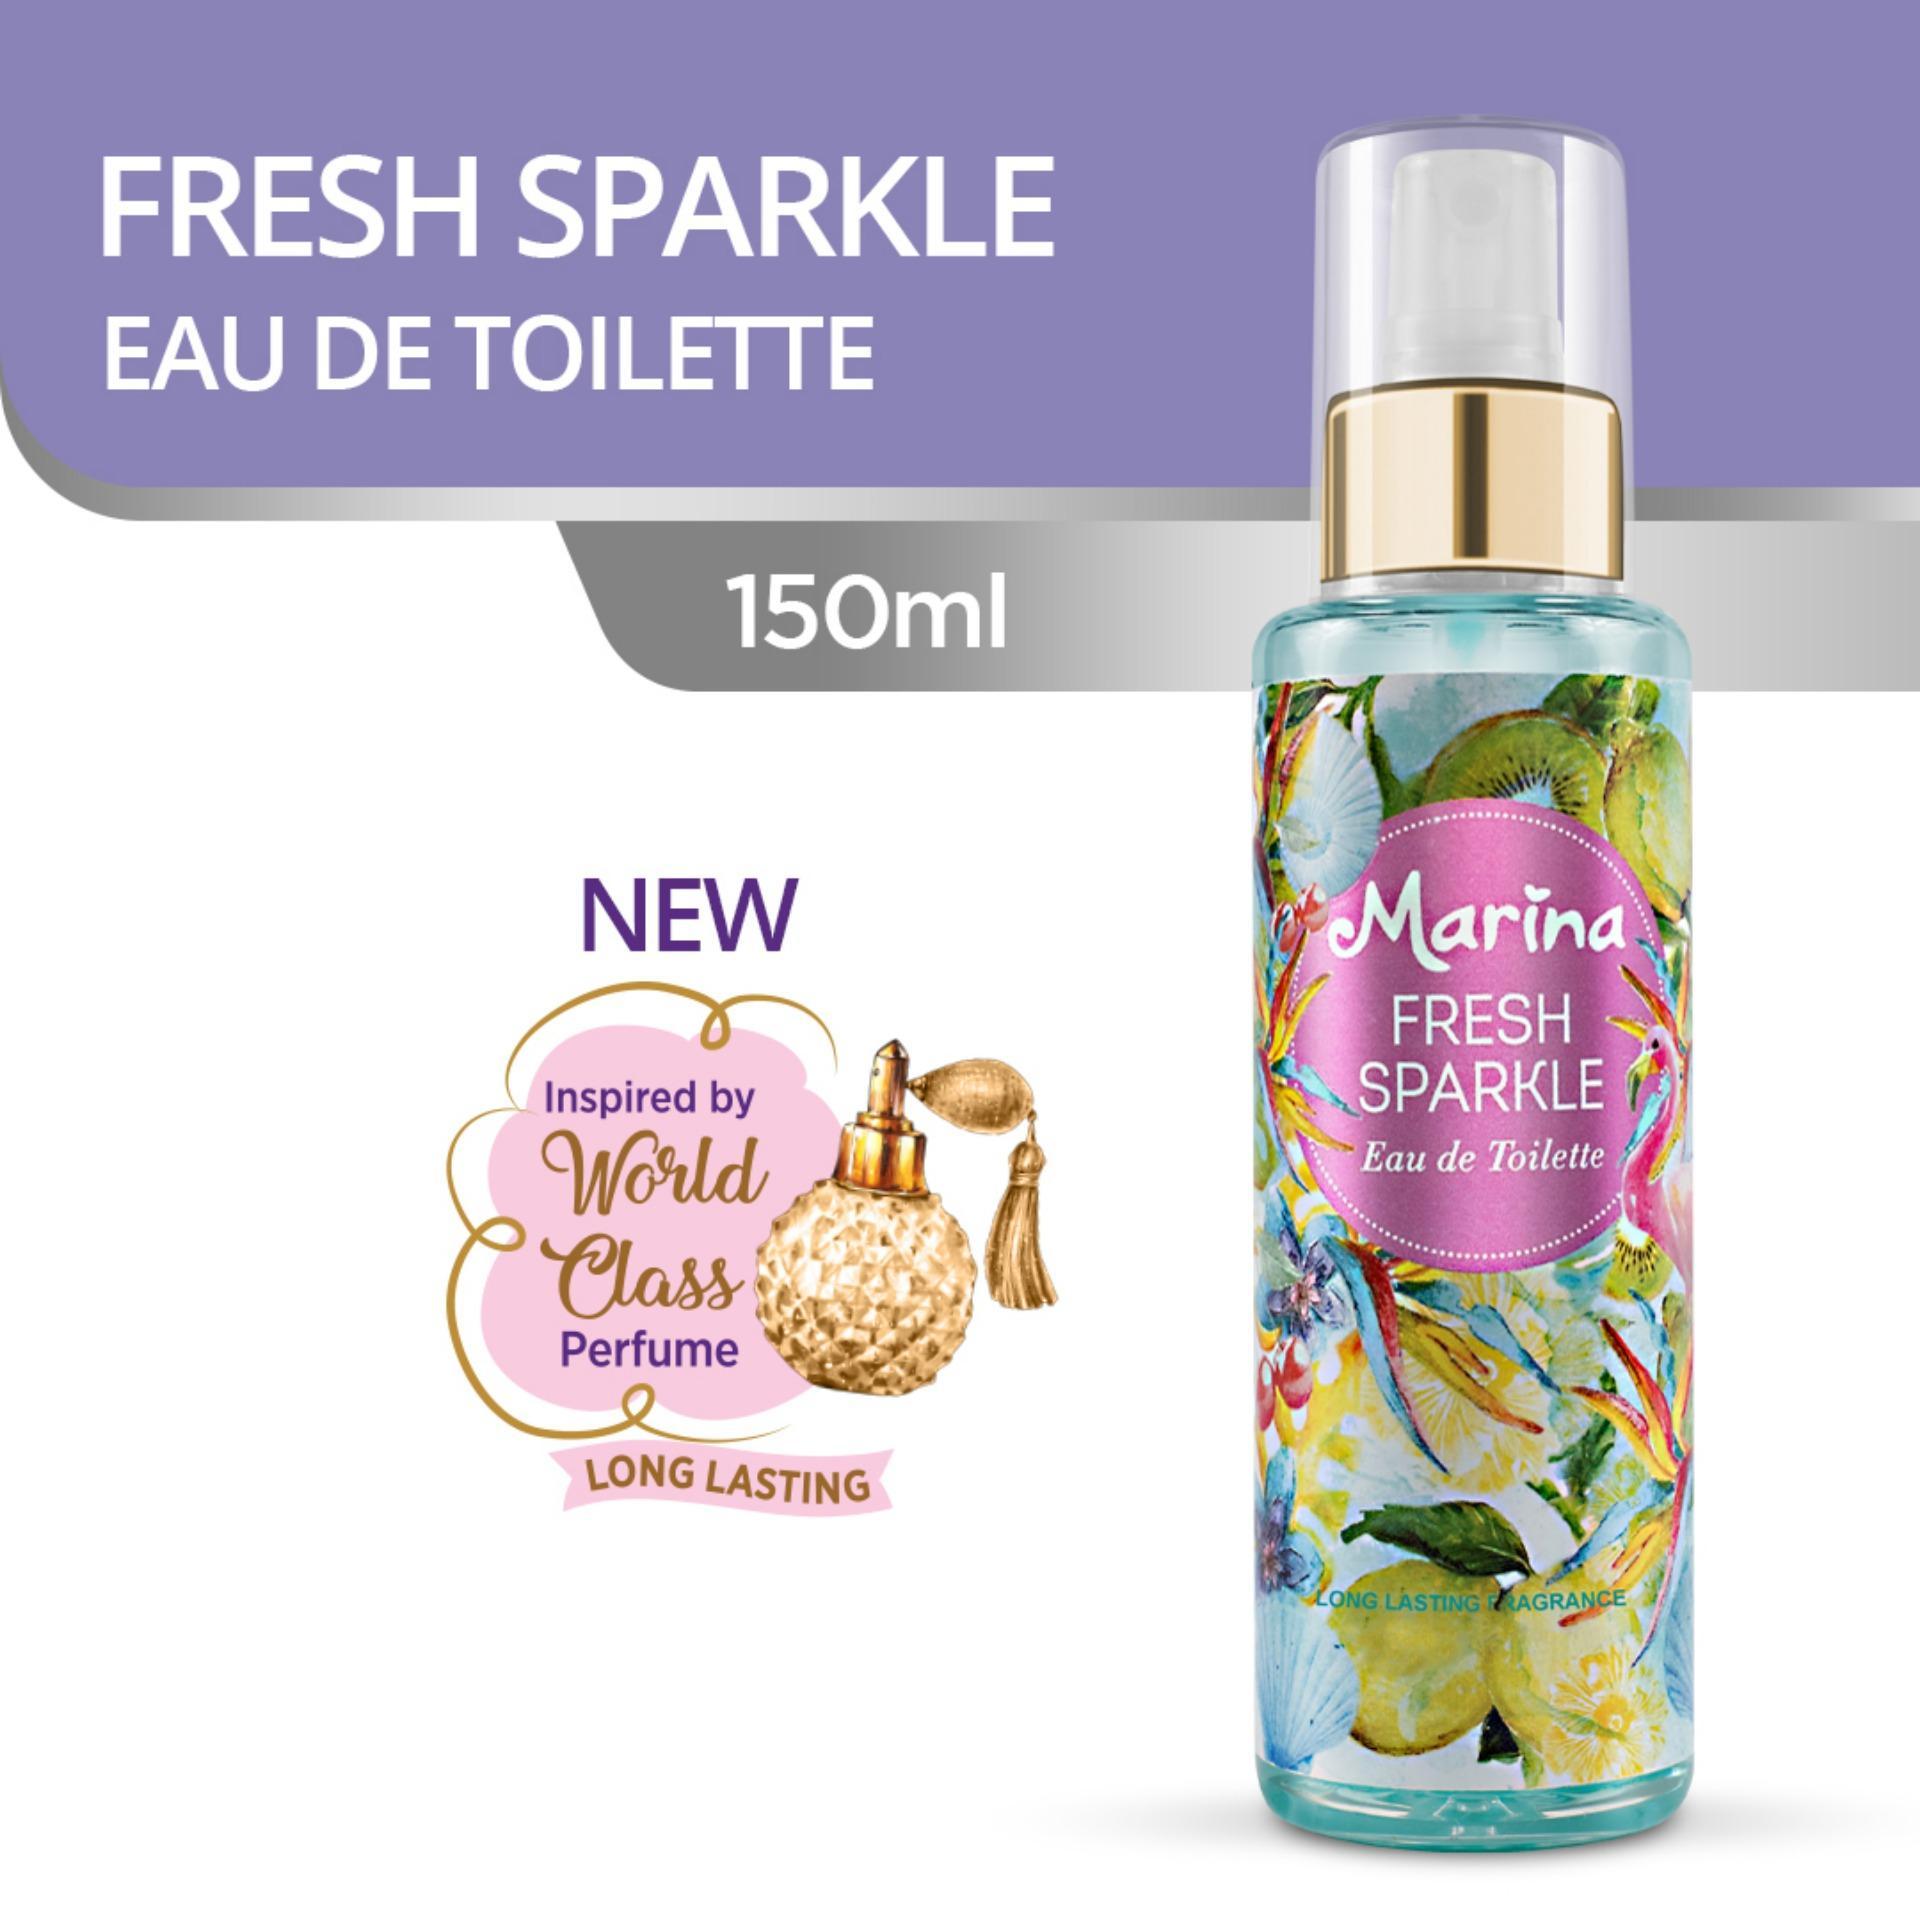 Marina Eau De Toilette - Fresh Sparkle [150 mL]